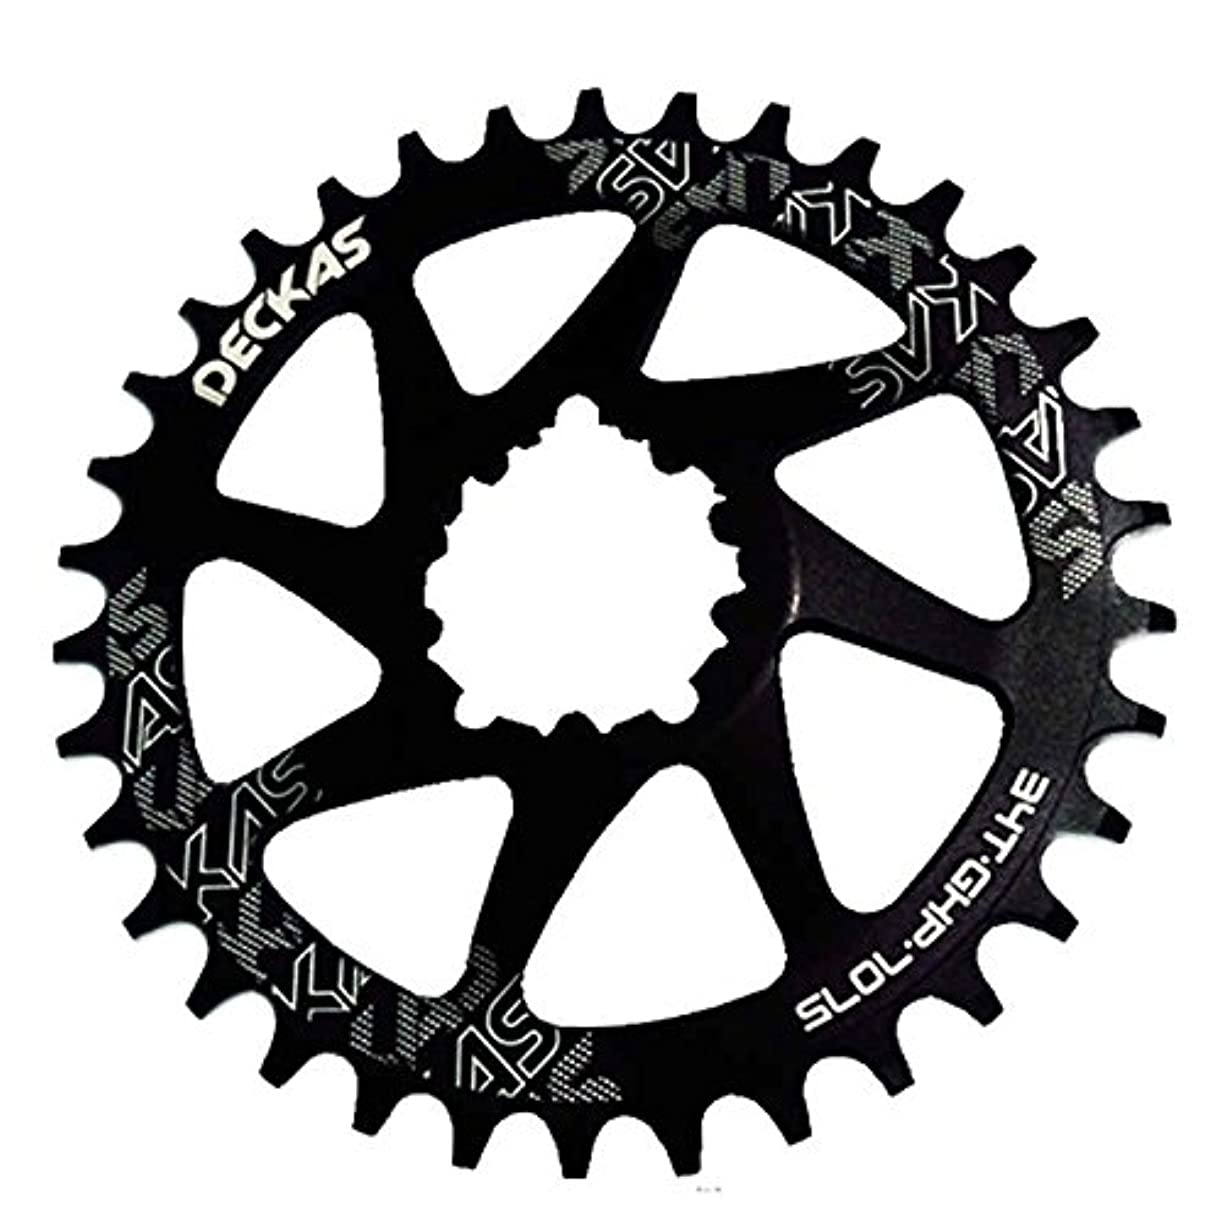 分迫害不実Propenary - GXP bicycle crankset Al 7075 CNC32T 34T Narrow Wide Chainring Chainwheel for Sram XX1 XO1 X1 GX XO X9 crankset bicycle parts [ 38T Black ]